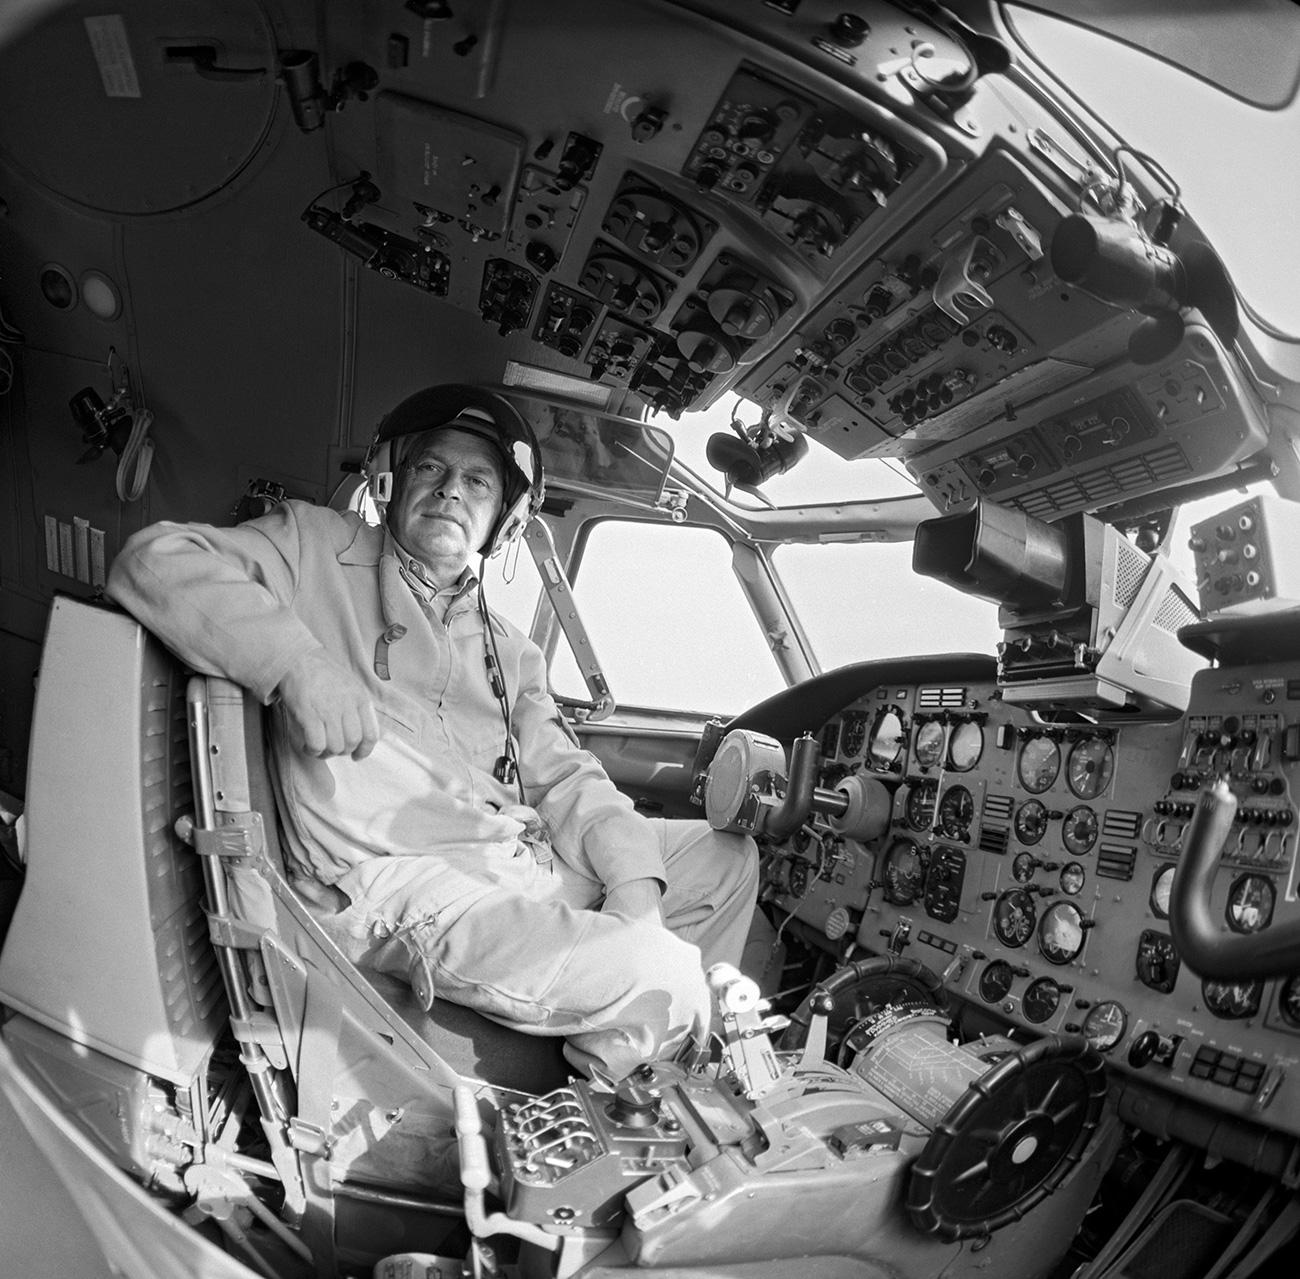 Pilot uji coba Vladimir Tkachenko di kokpit An-32 pada 1986. Sumber: Denisov Vadim/RIA Novosti